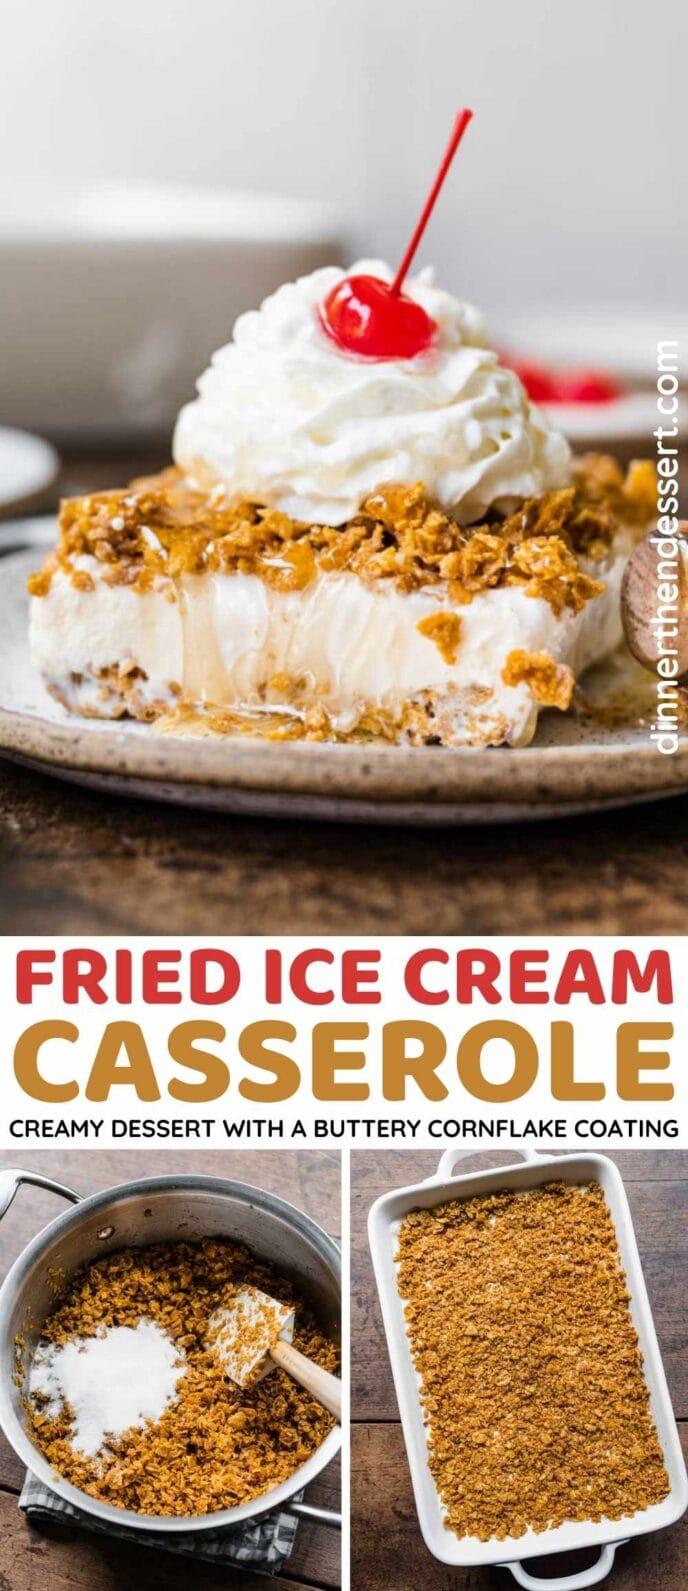 Fried Ice Cream Collage